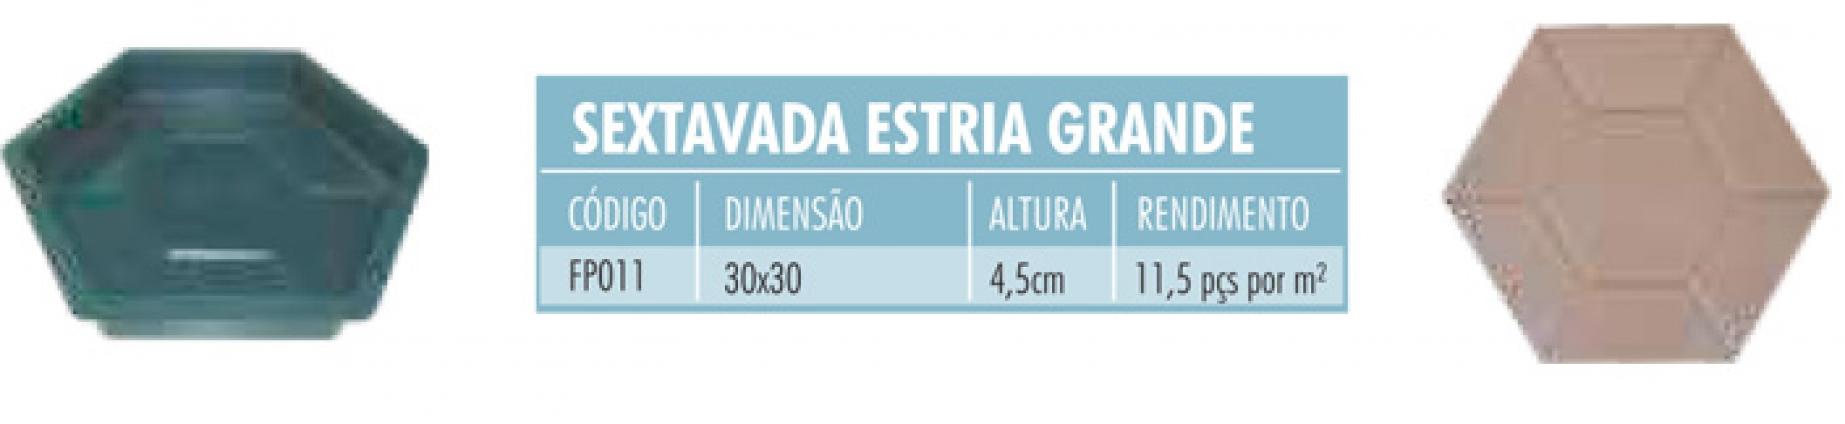 FormasPlasticas-20150313115519.jpg